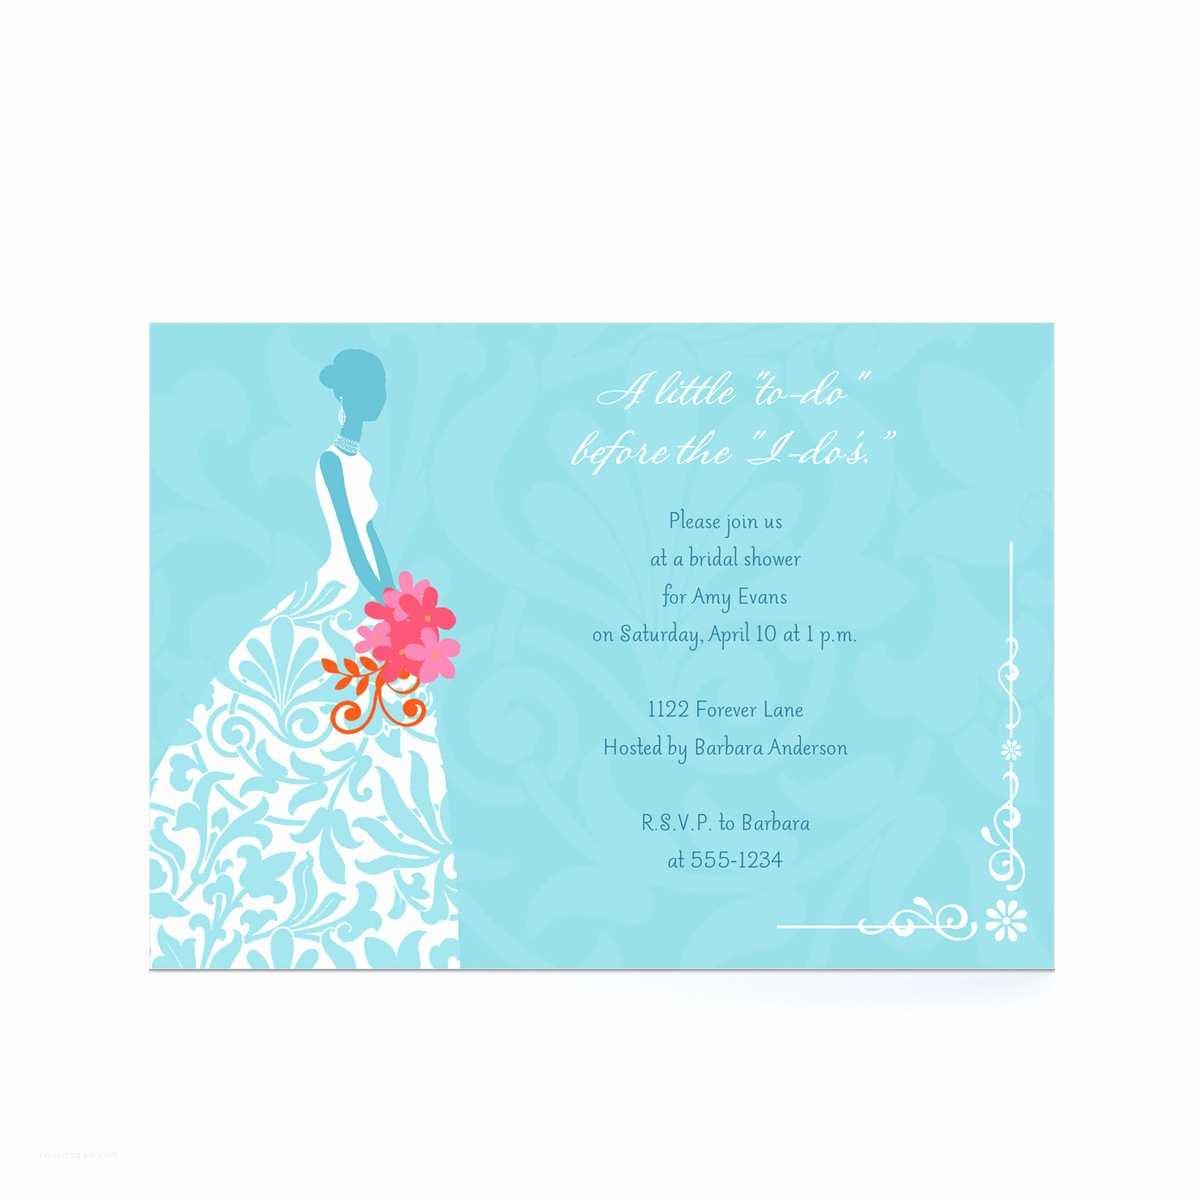 Hallmark Wedding Invitations Hallmark Wedding Invitation Ecards – Mini Bridal